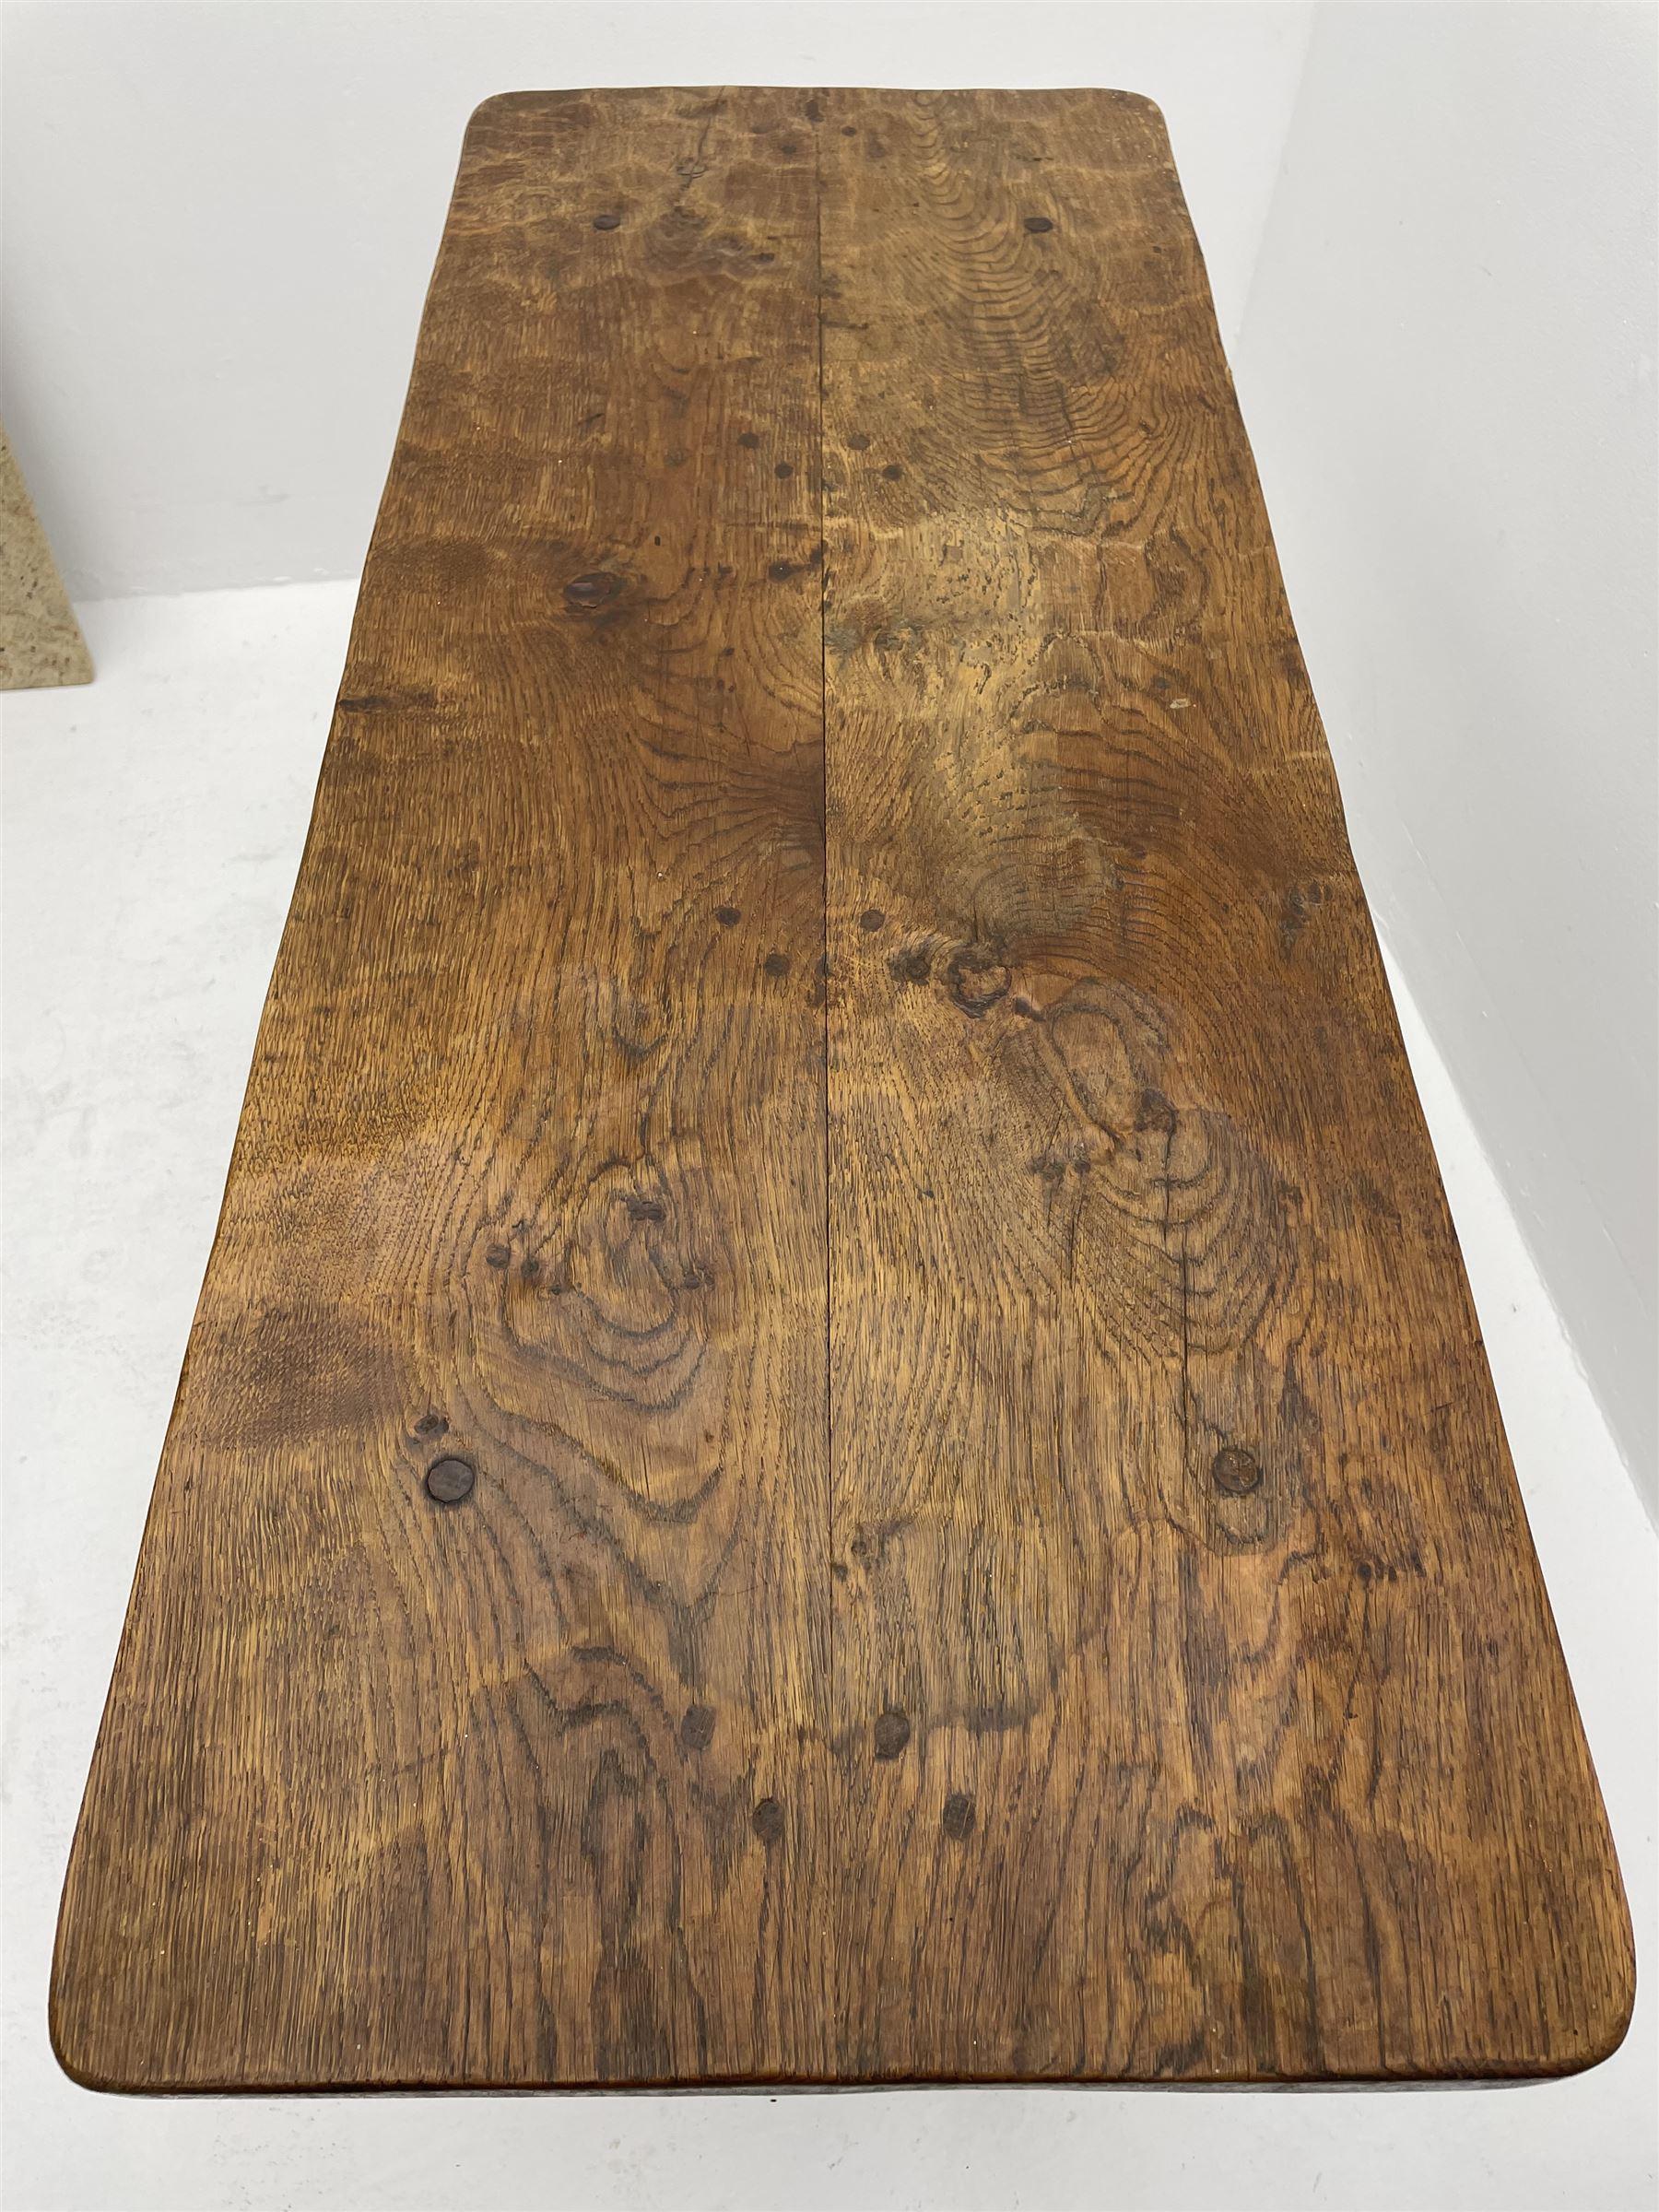 'Gnomeman' adzed oak side table - Image 3 of 4